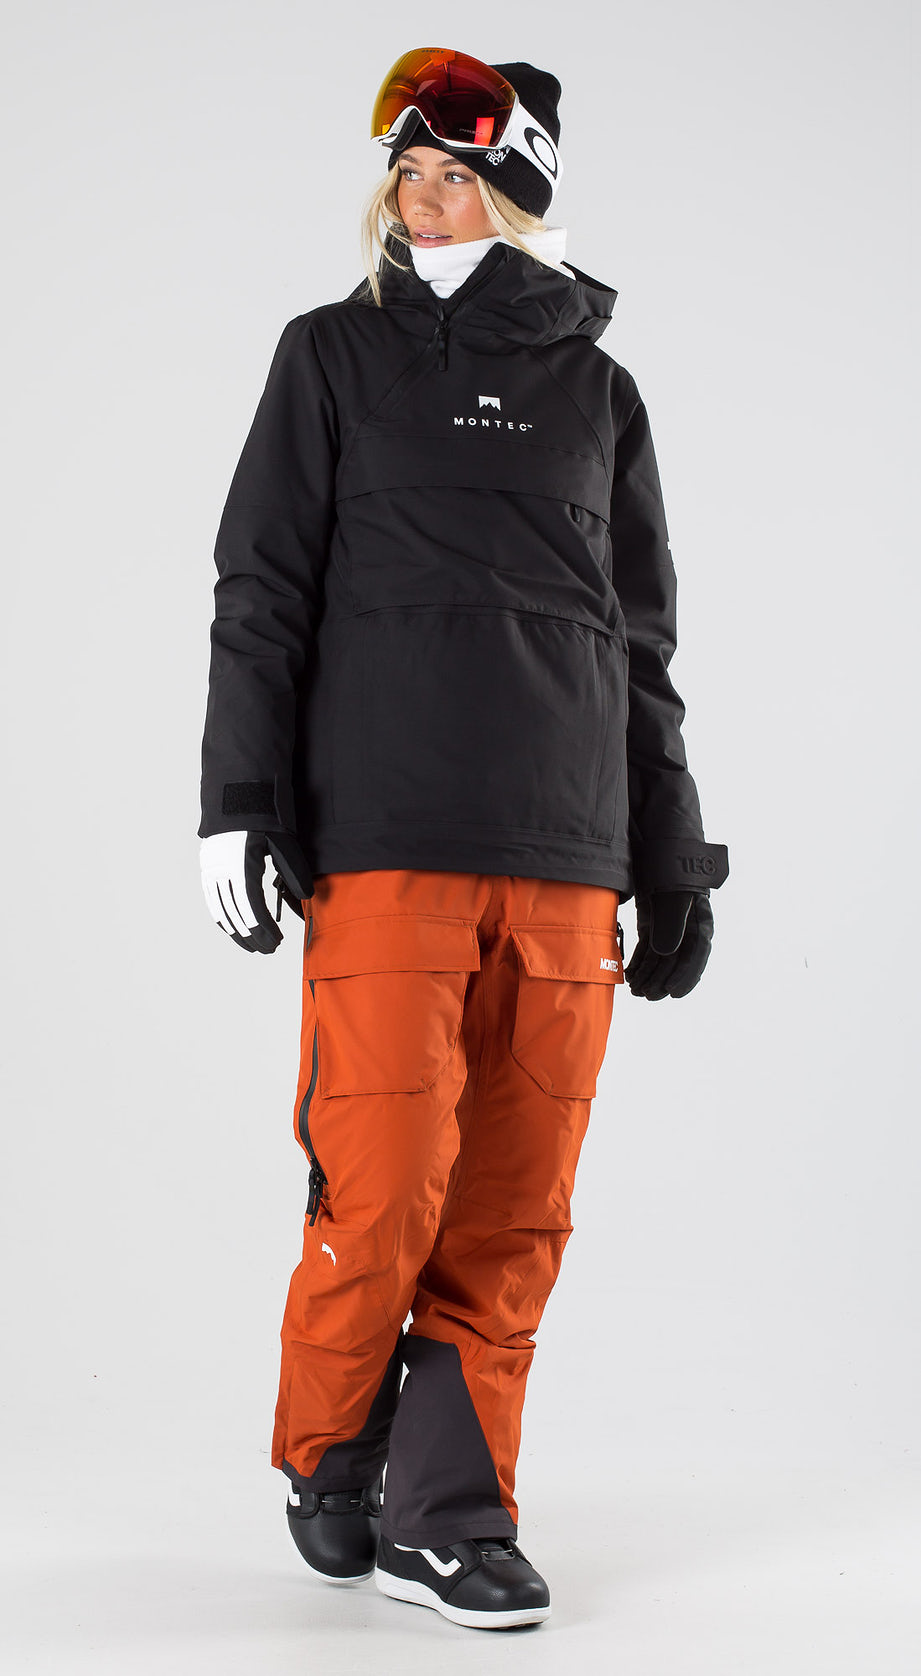 Montec Dune W Black Snowboardkleidung Multi